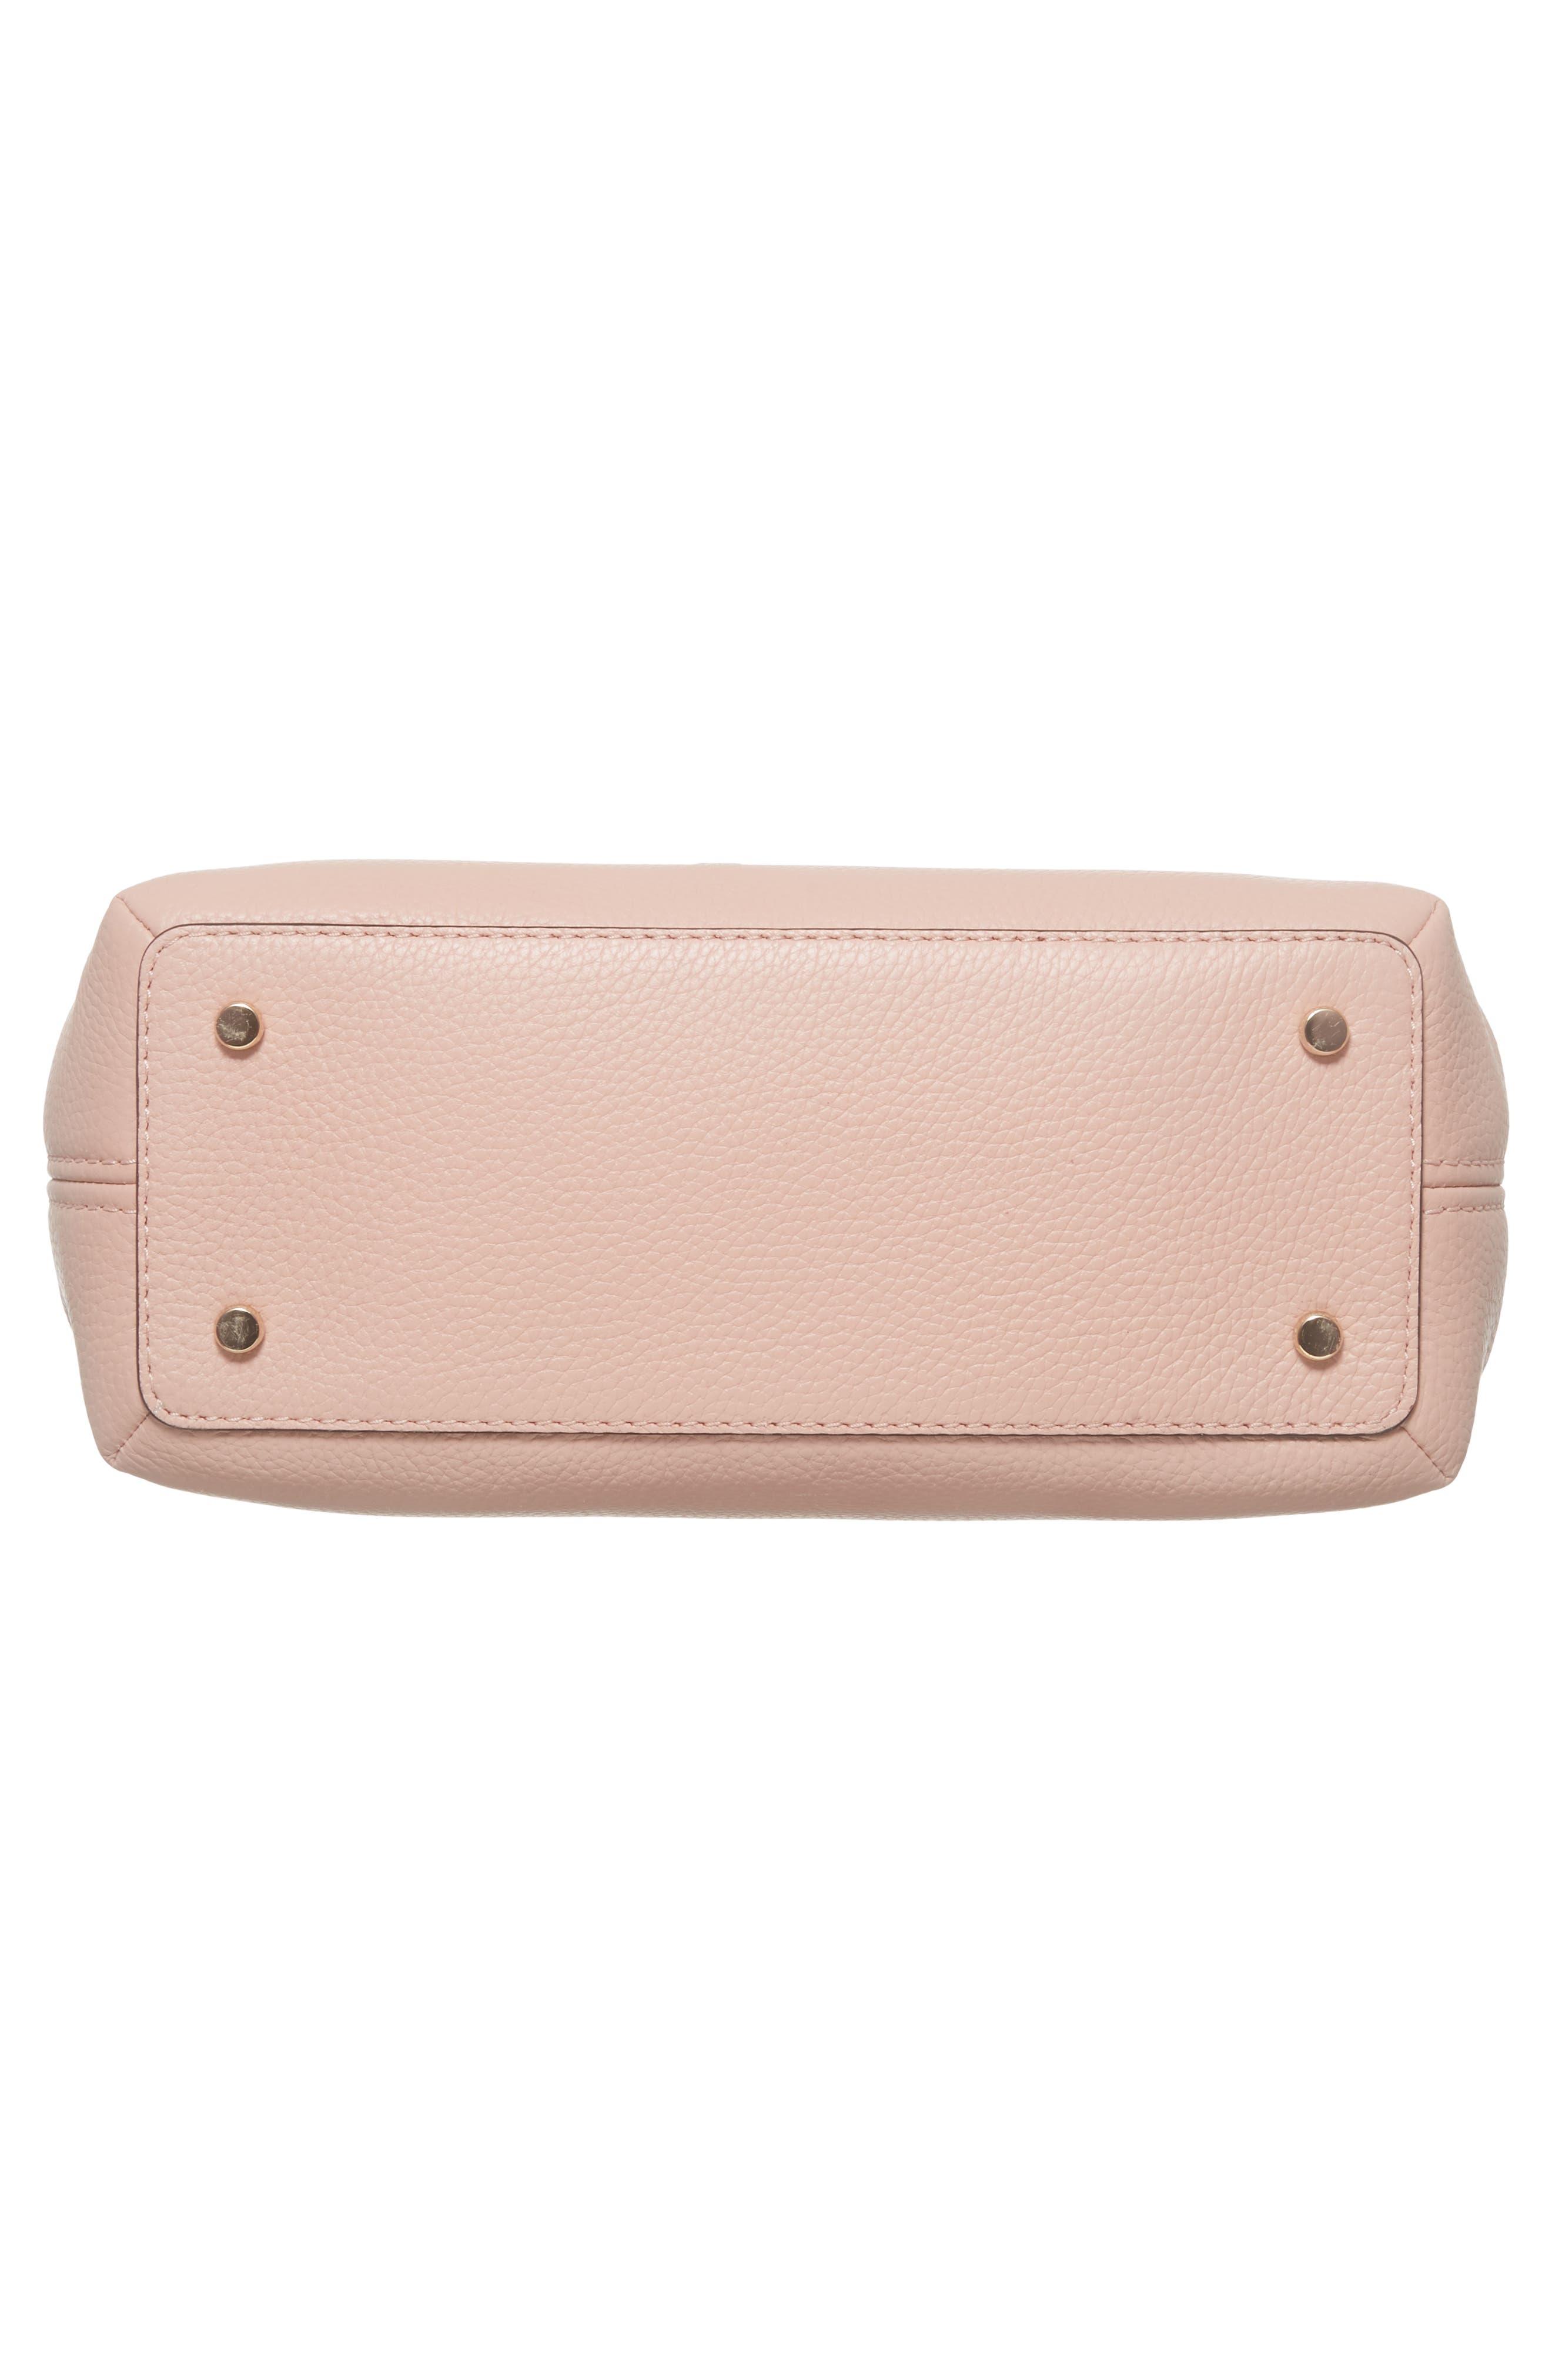 jackson street – small octavia leather satchel,                             Alternate thumbnail 6, color,                             Rosy Cheeks